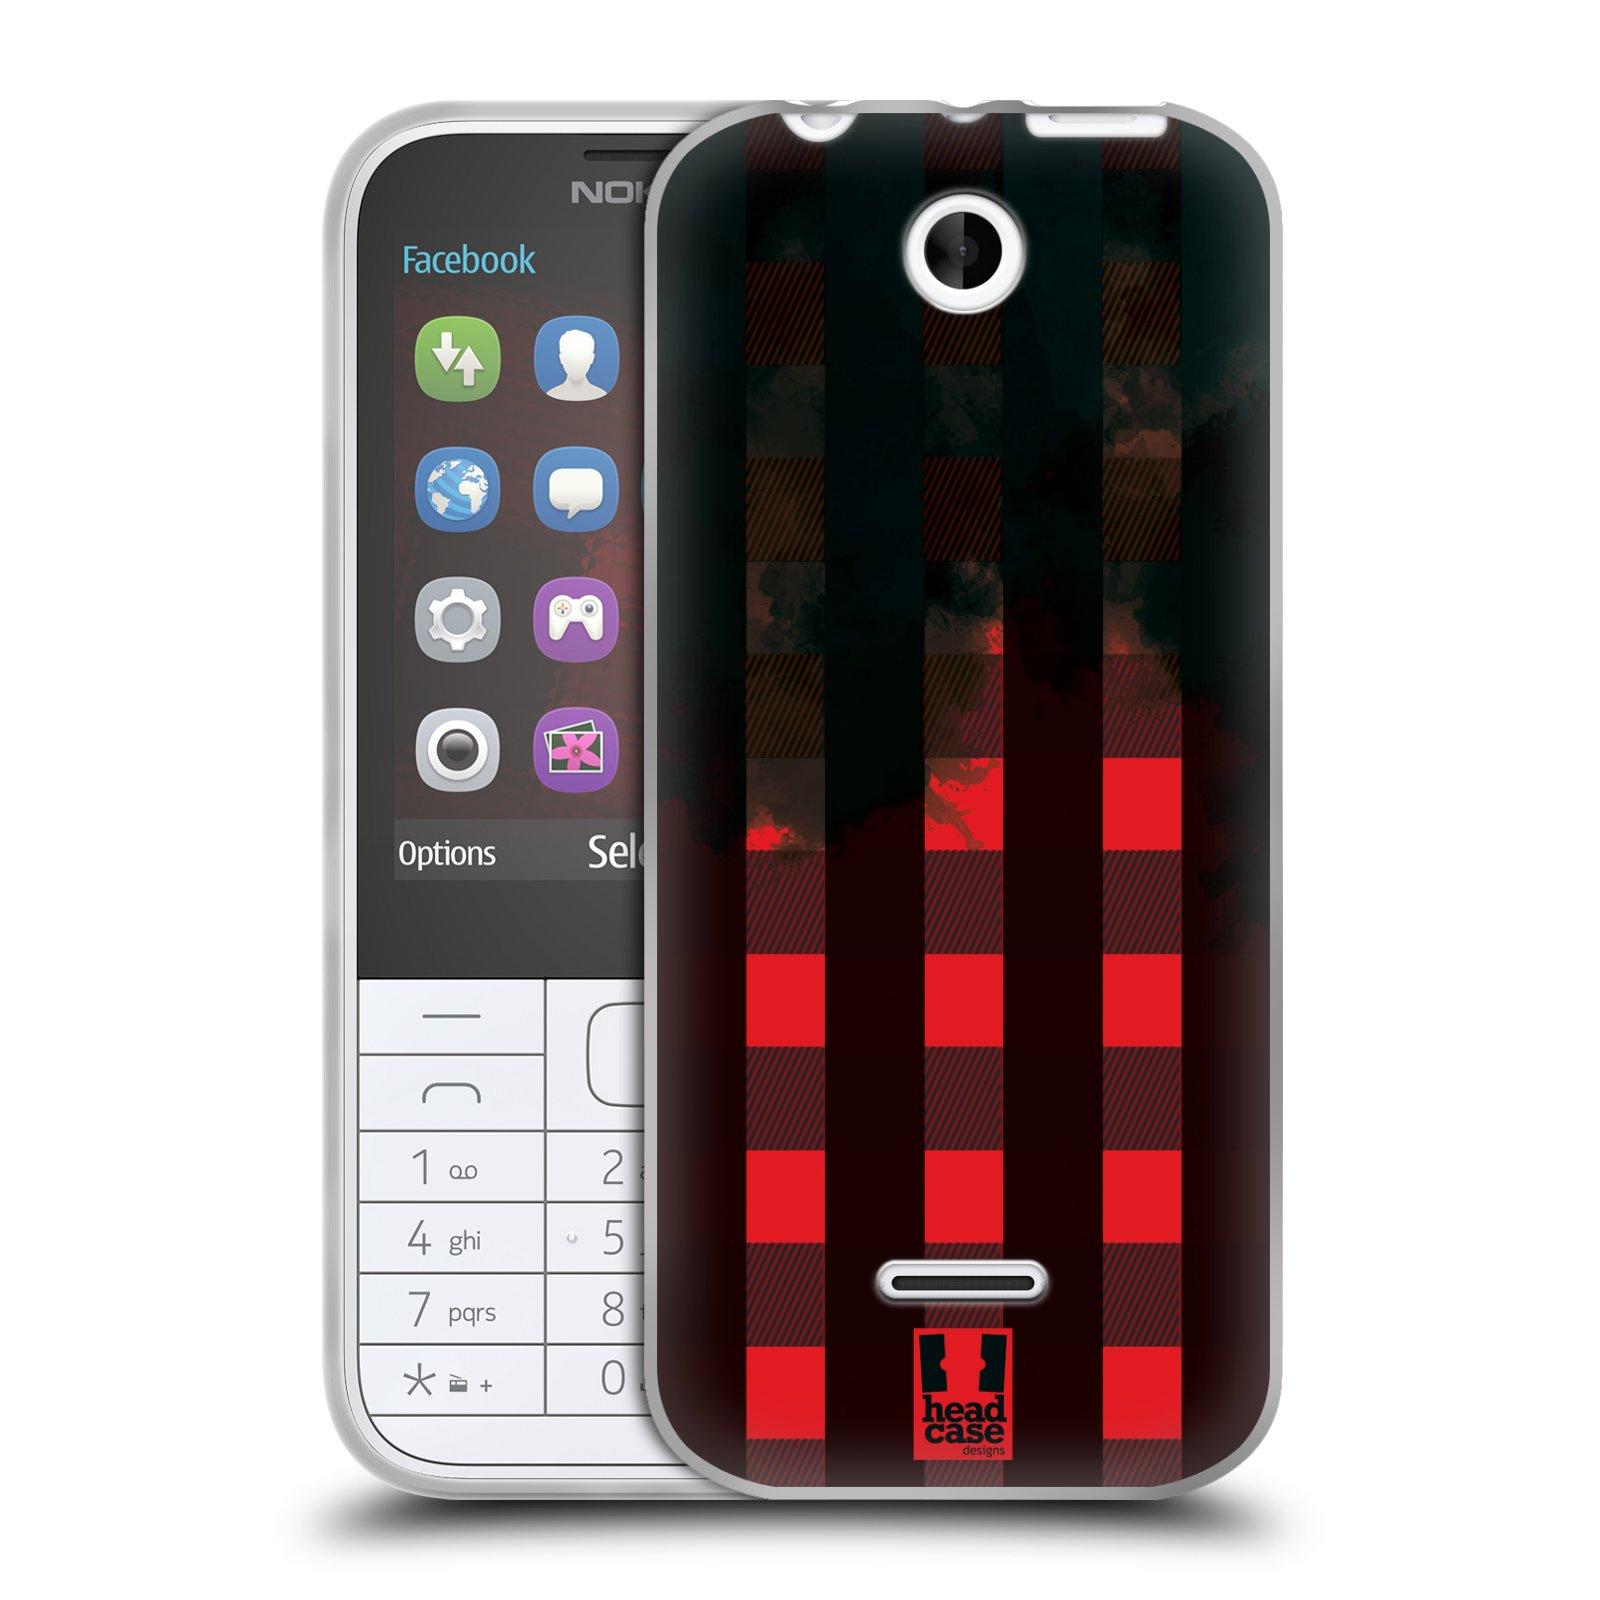 Silikonové pouzdro na mobil Nokia 225 HEAD CASE FLANEL RED BLACK (Silikonový kryt či obal na mobilní telefon Nokia 225)